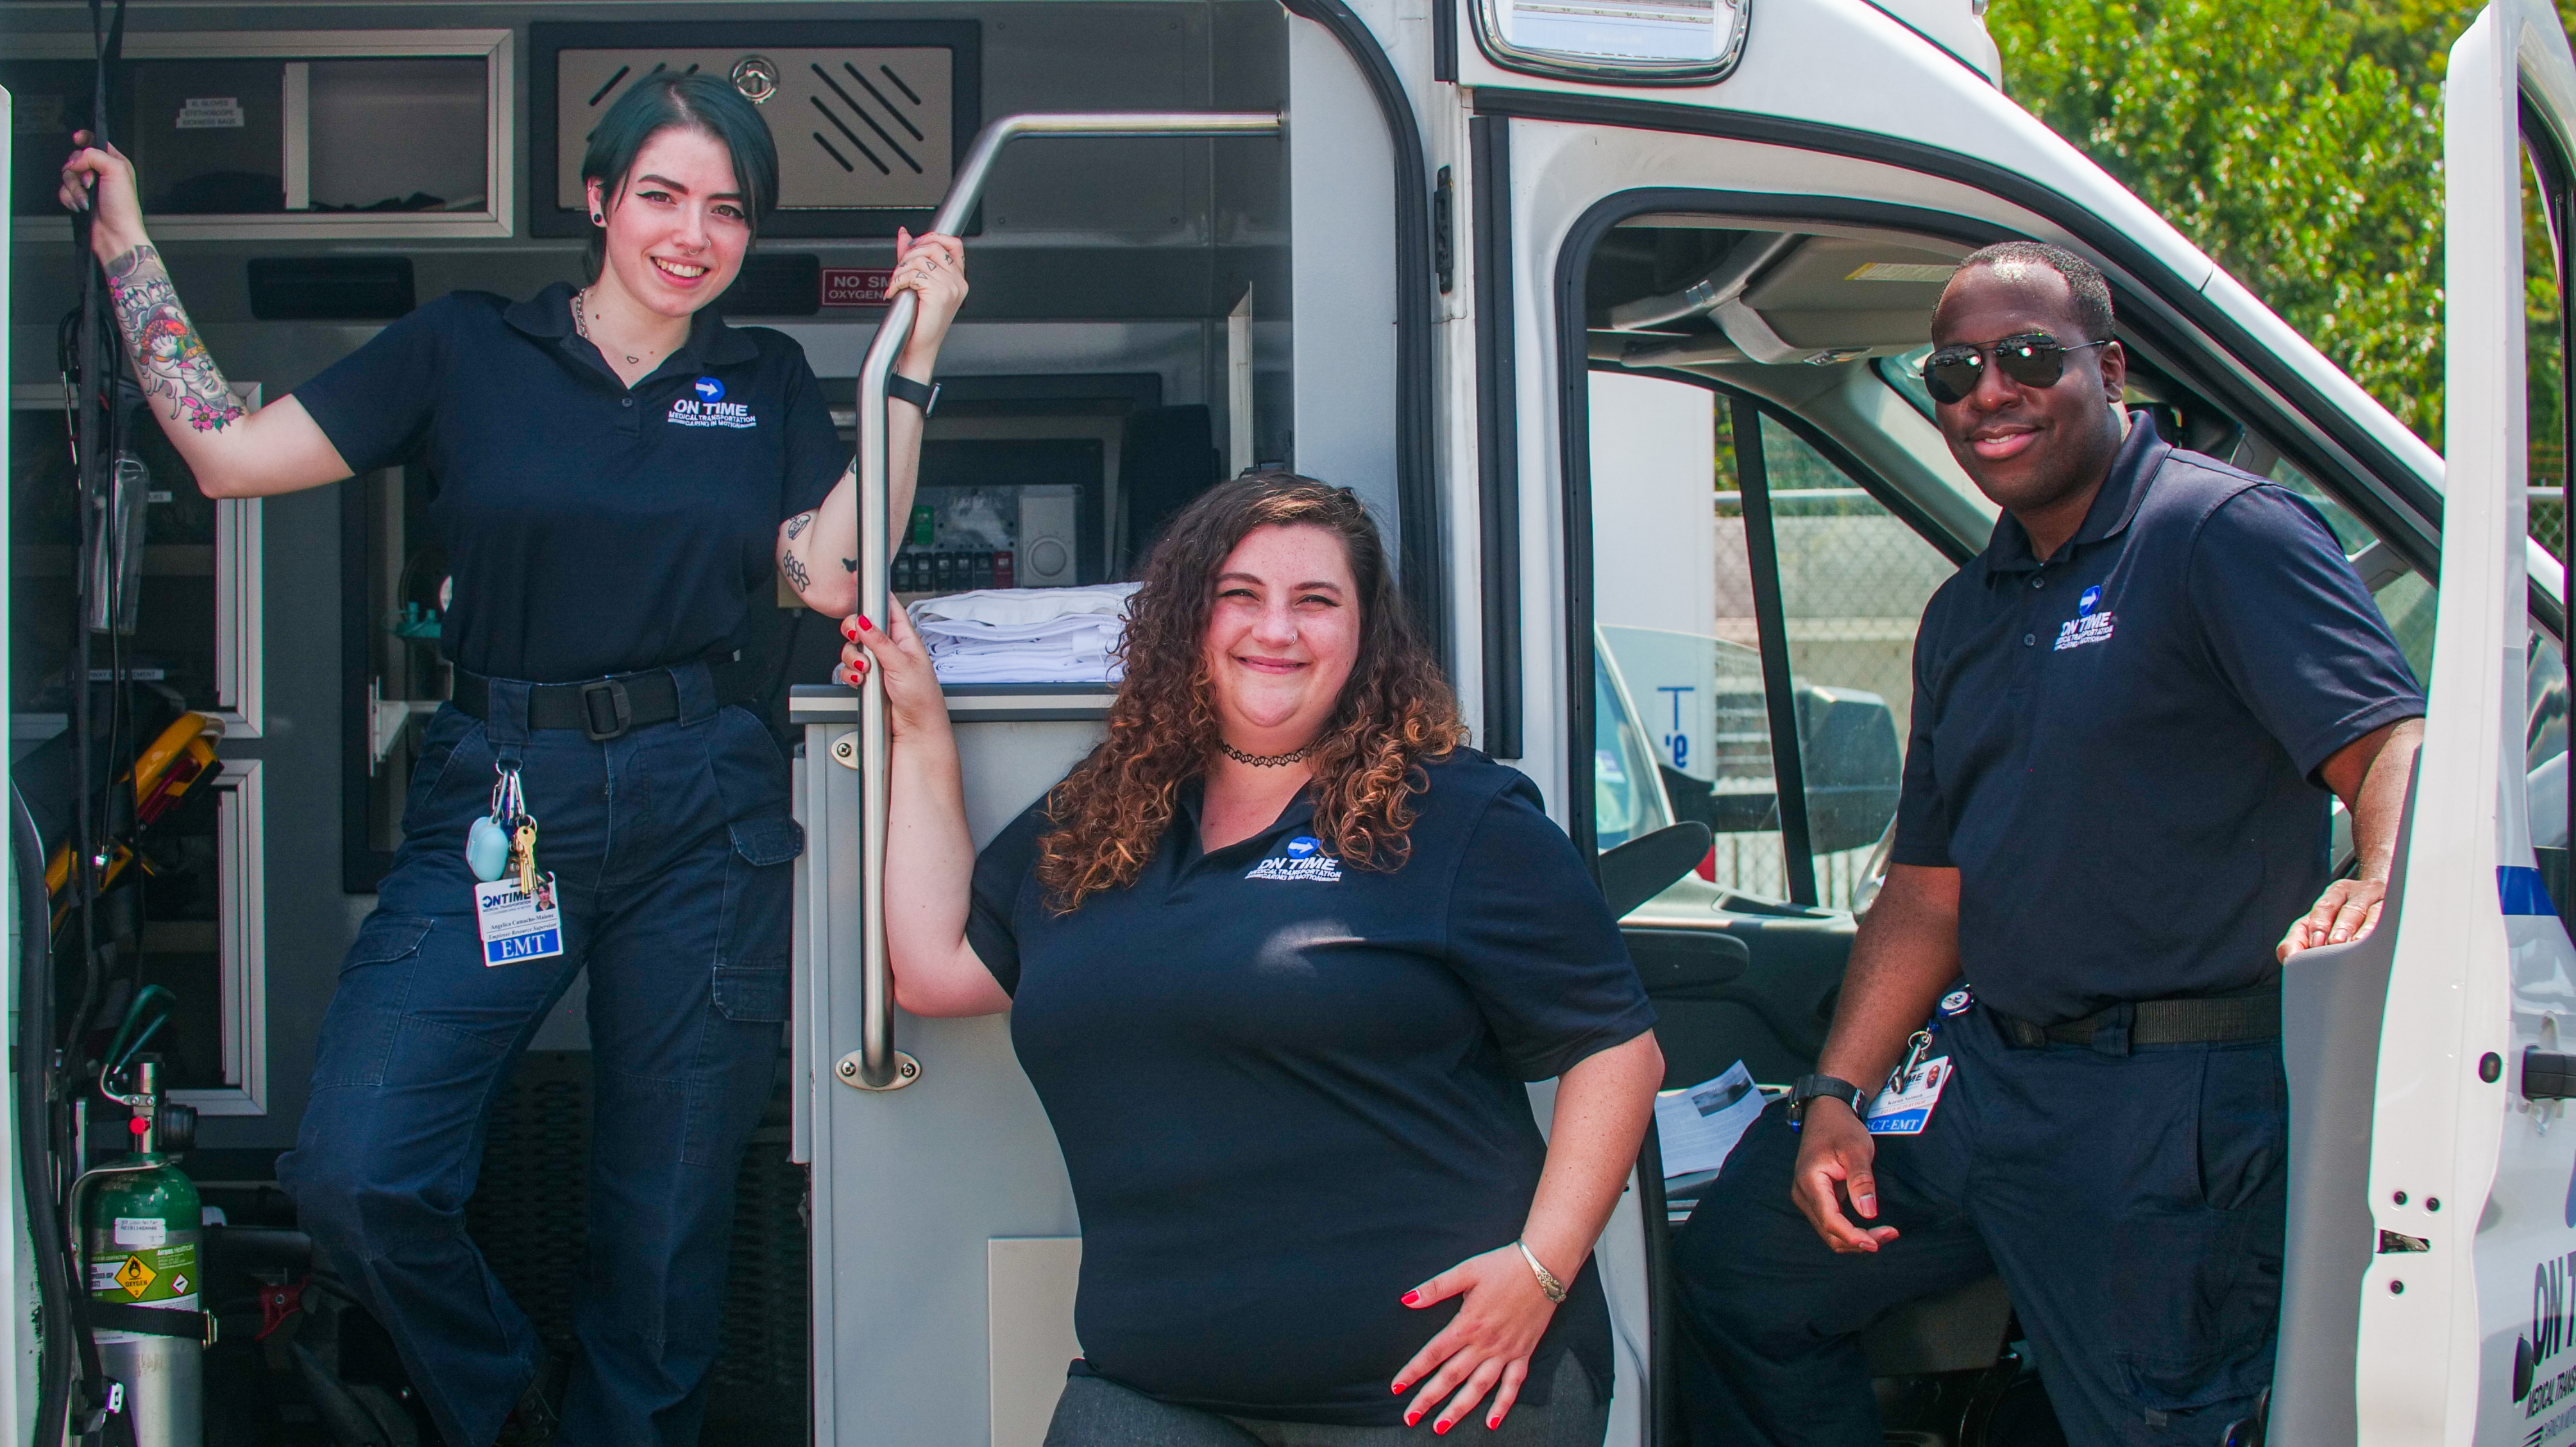 Driver Jobs Toms River NJ   On Time Ambulance